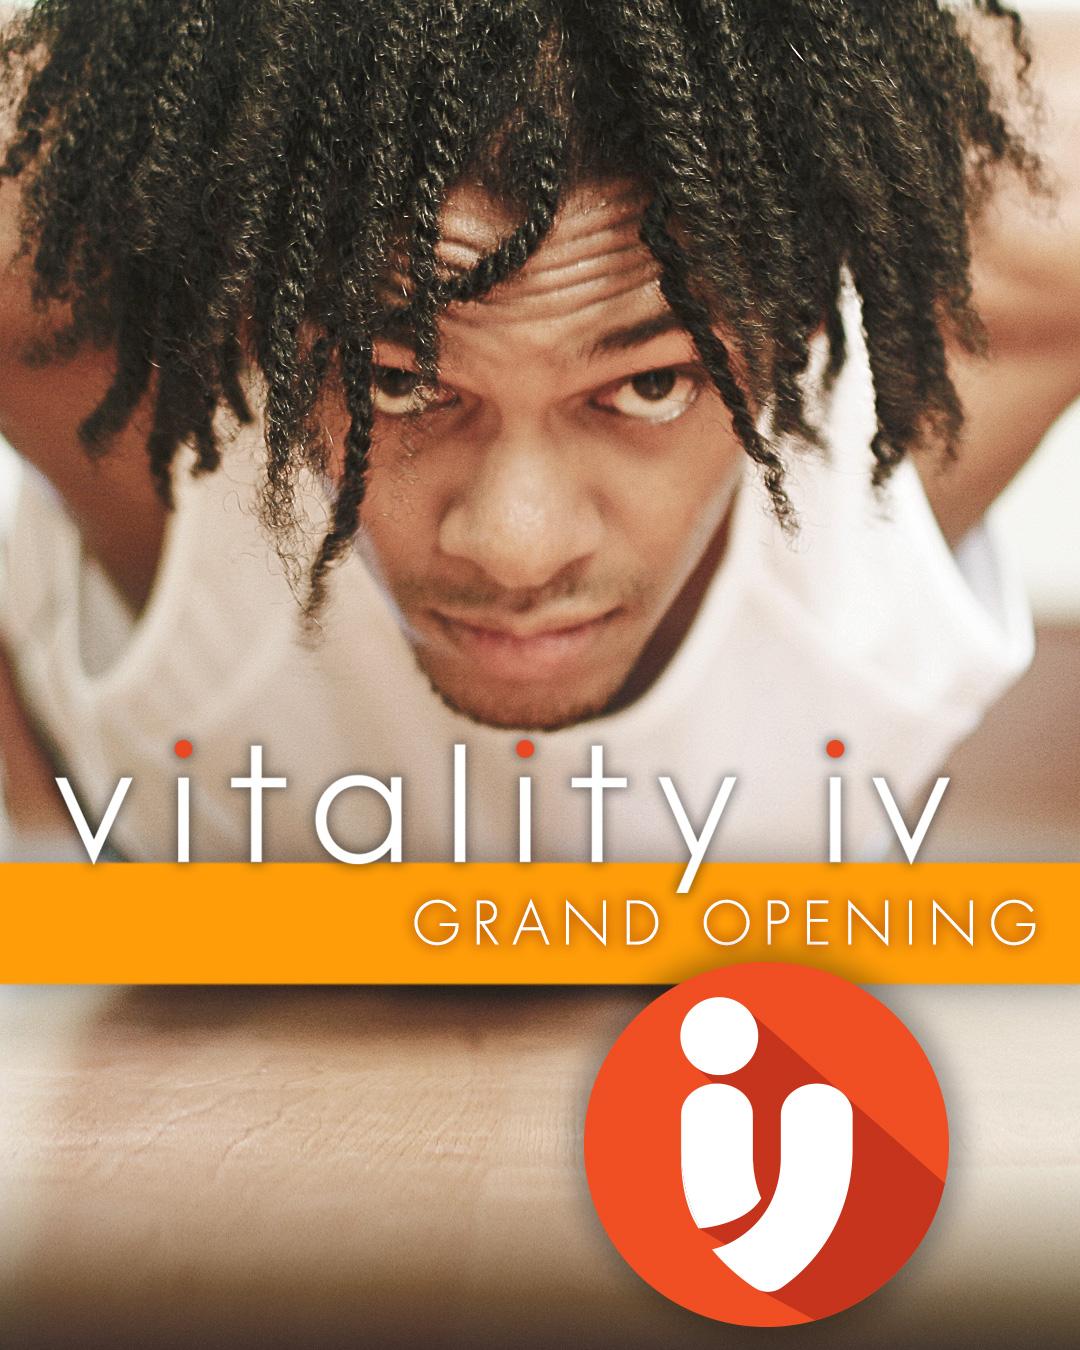 Vitality_IV_Grand_Opening-4.jpg